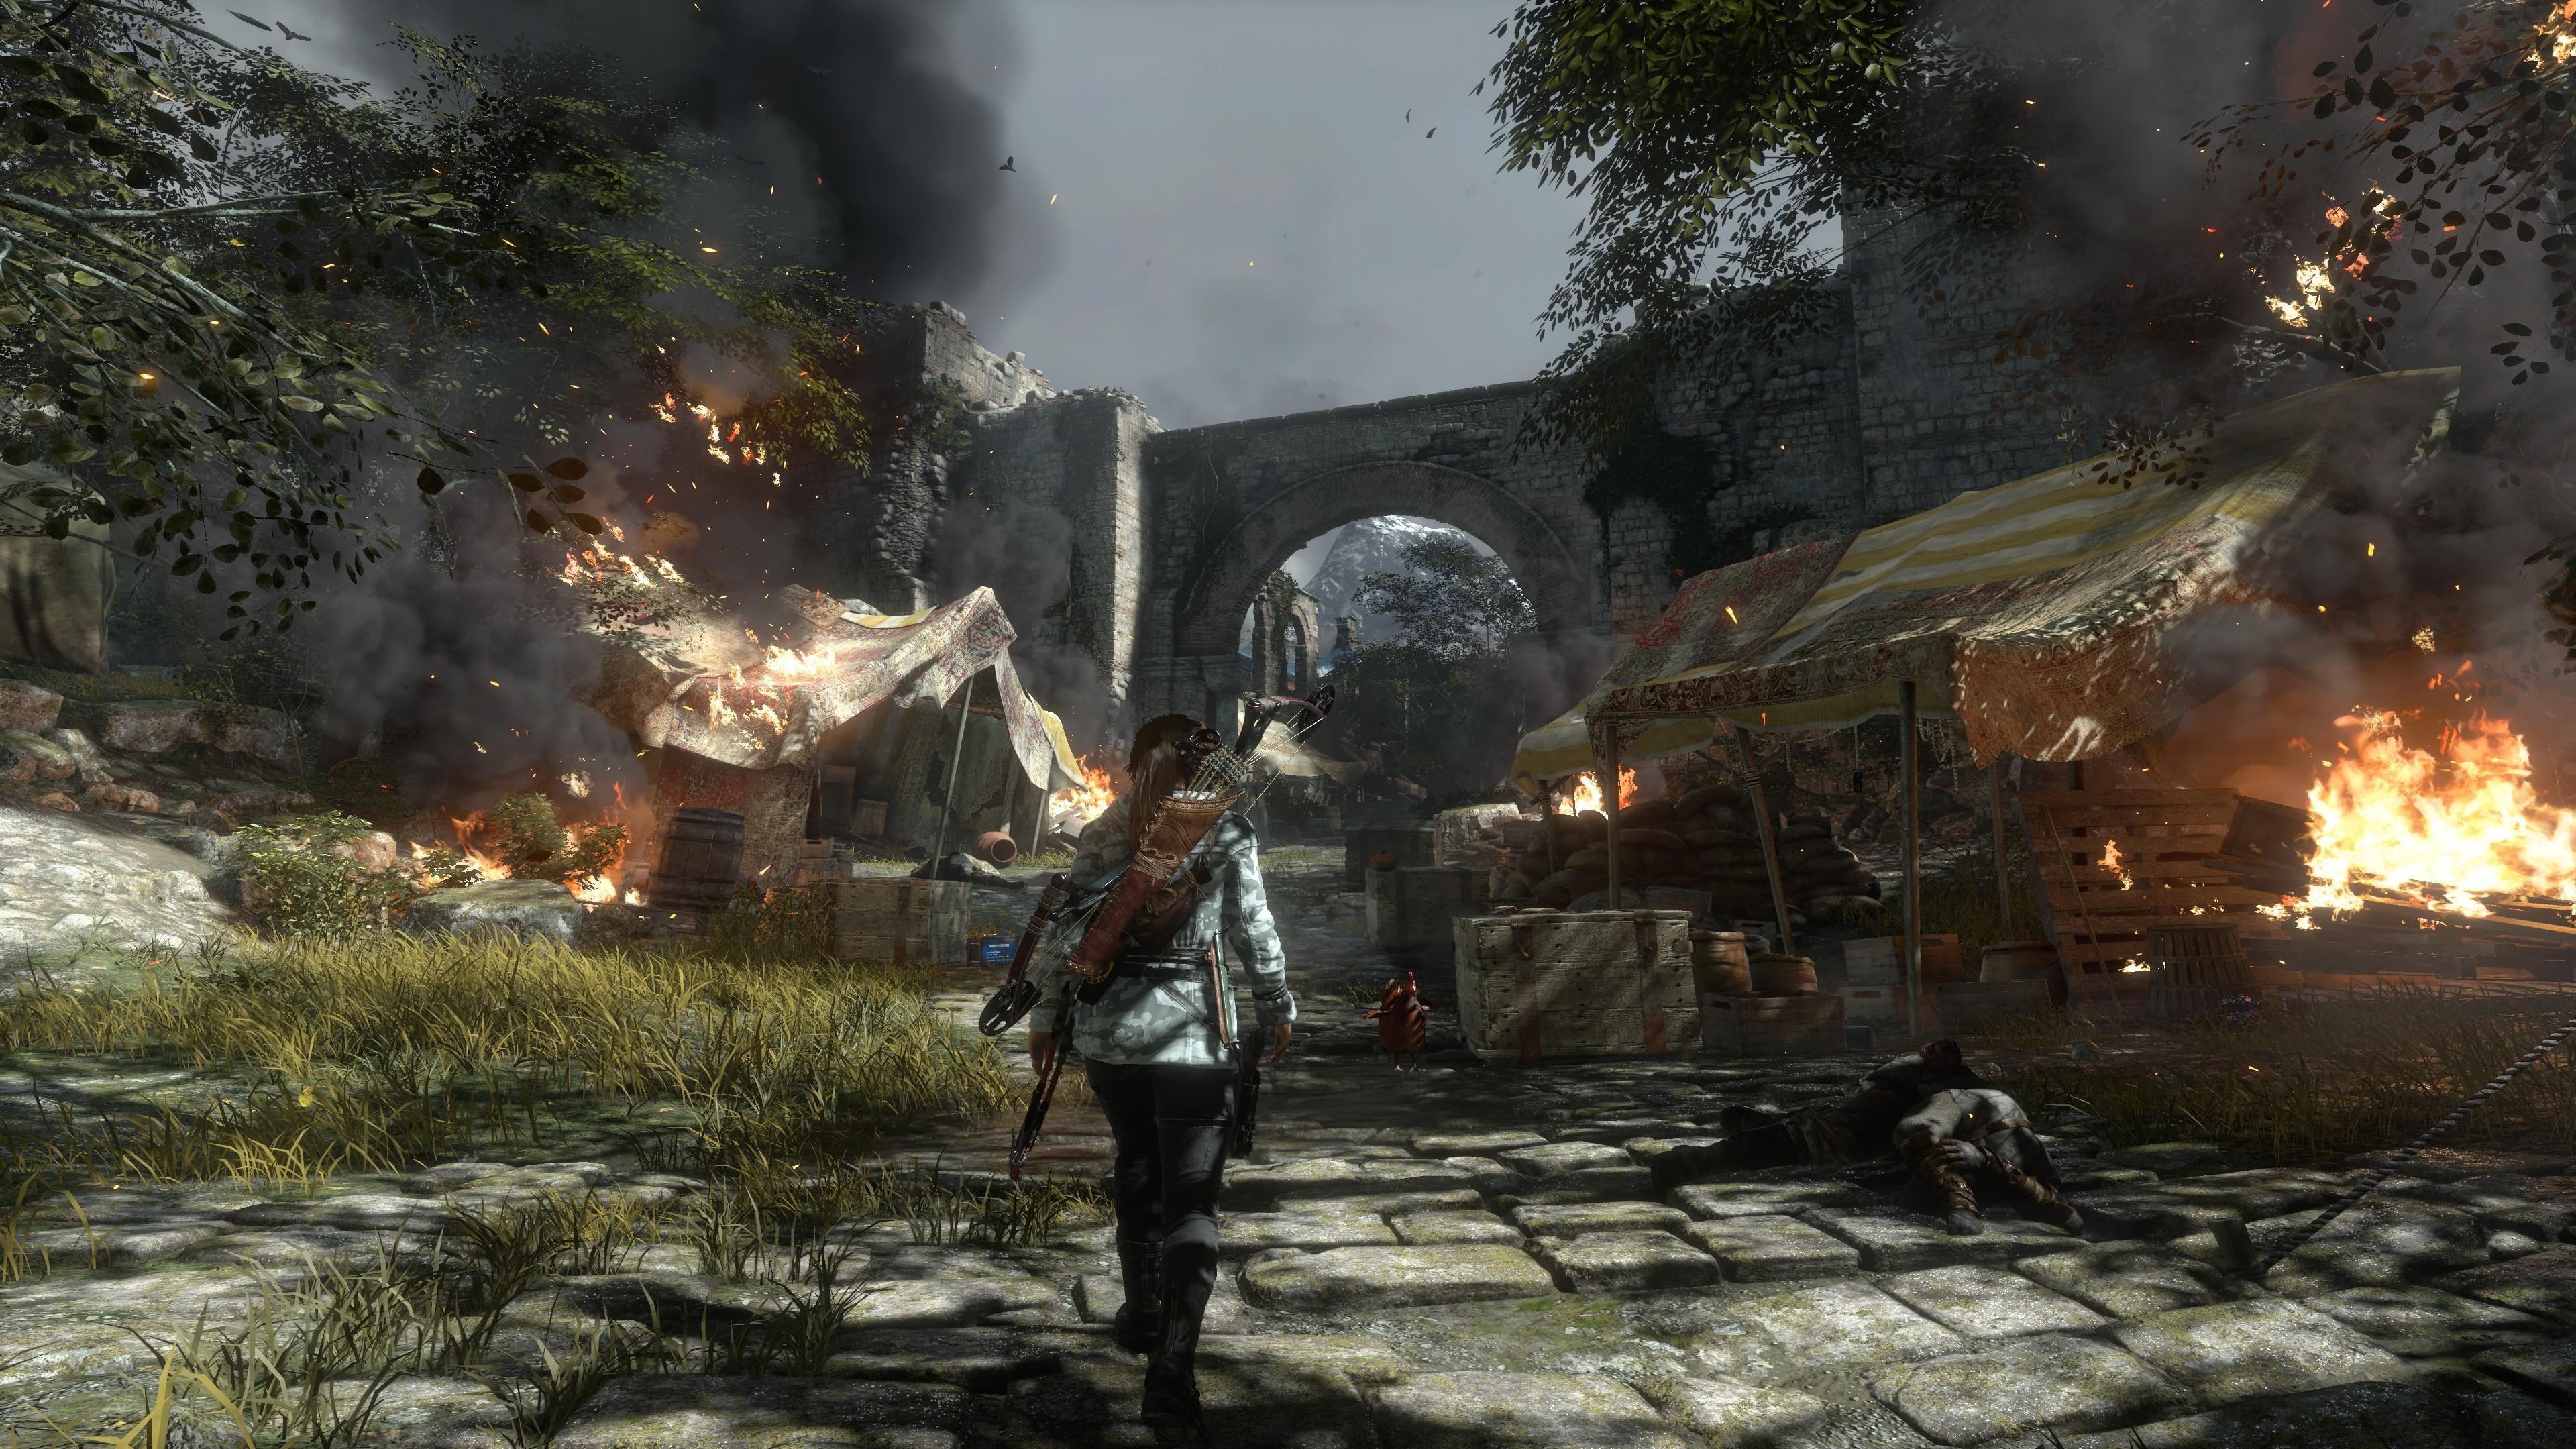 3d Crystal Wallpaper Wallpaper Rise Of The Tomb Raider Lara Croft Best Games